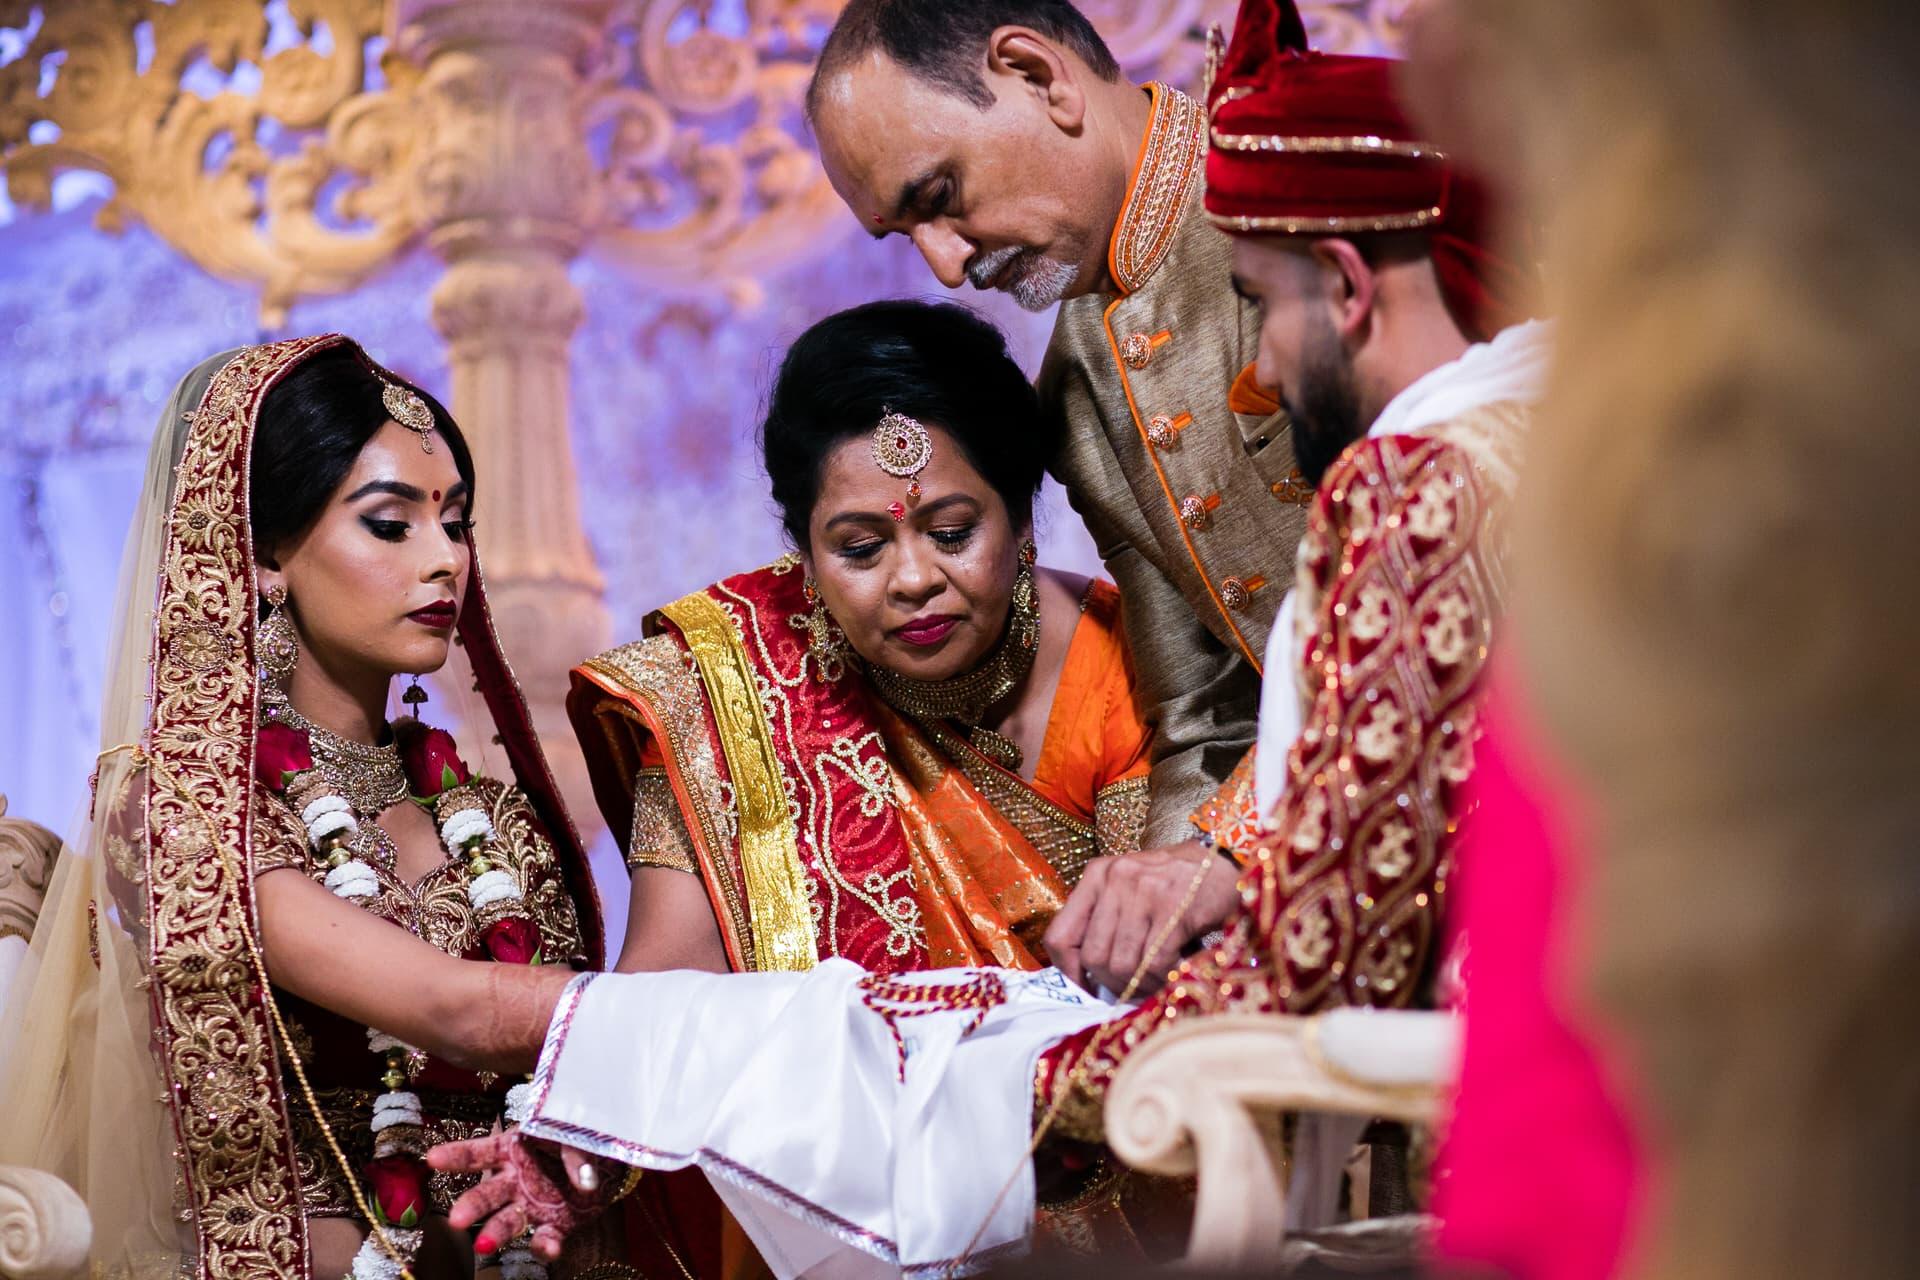 Parents giving Bride away